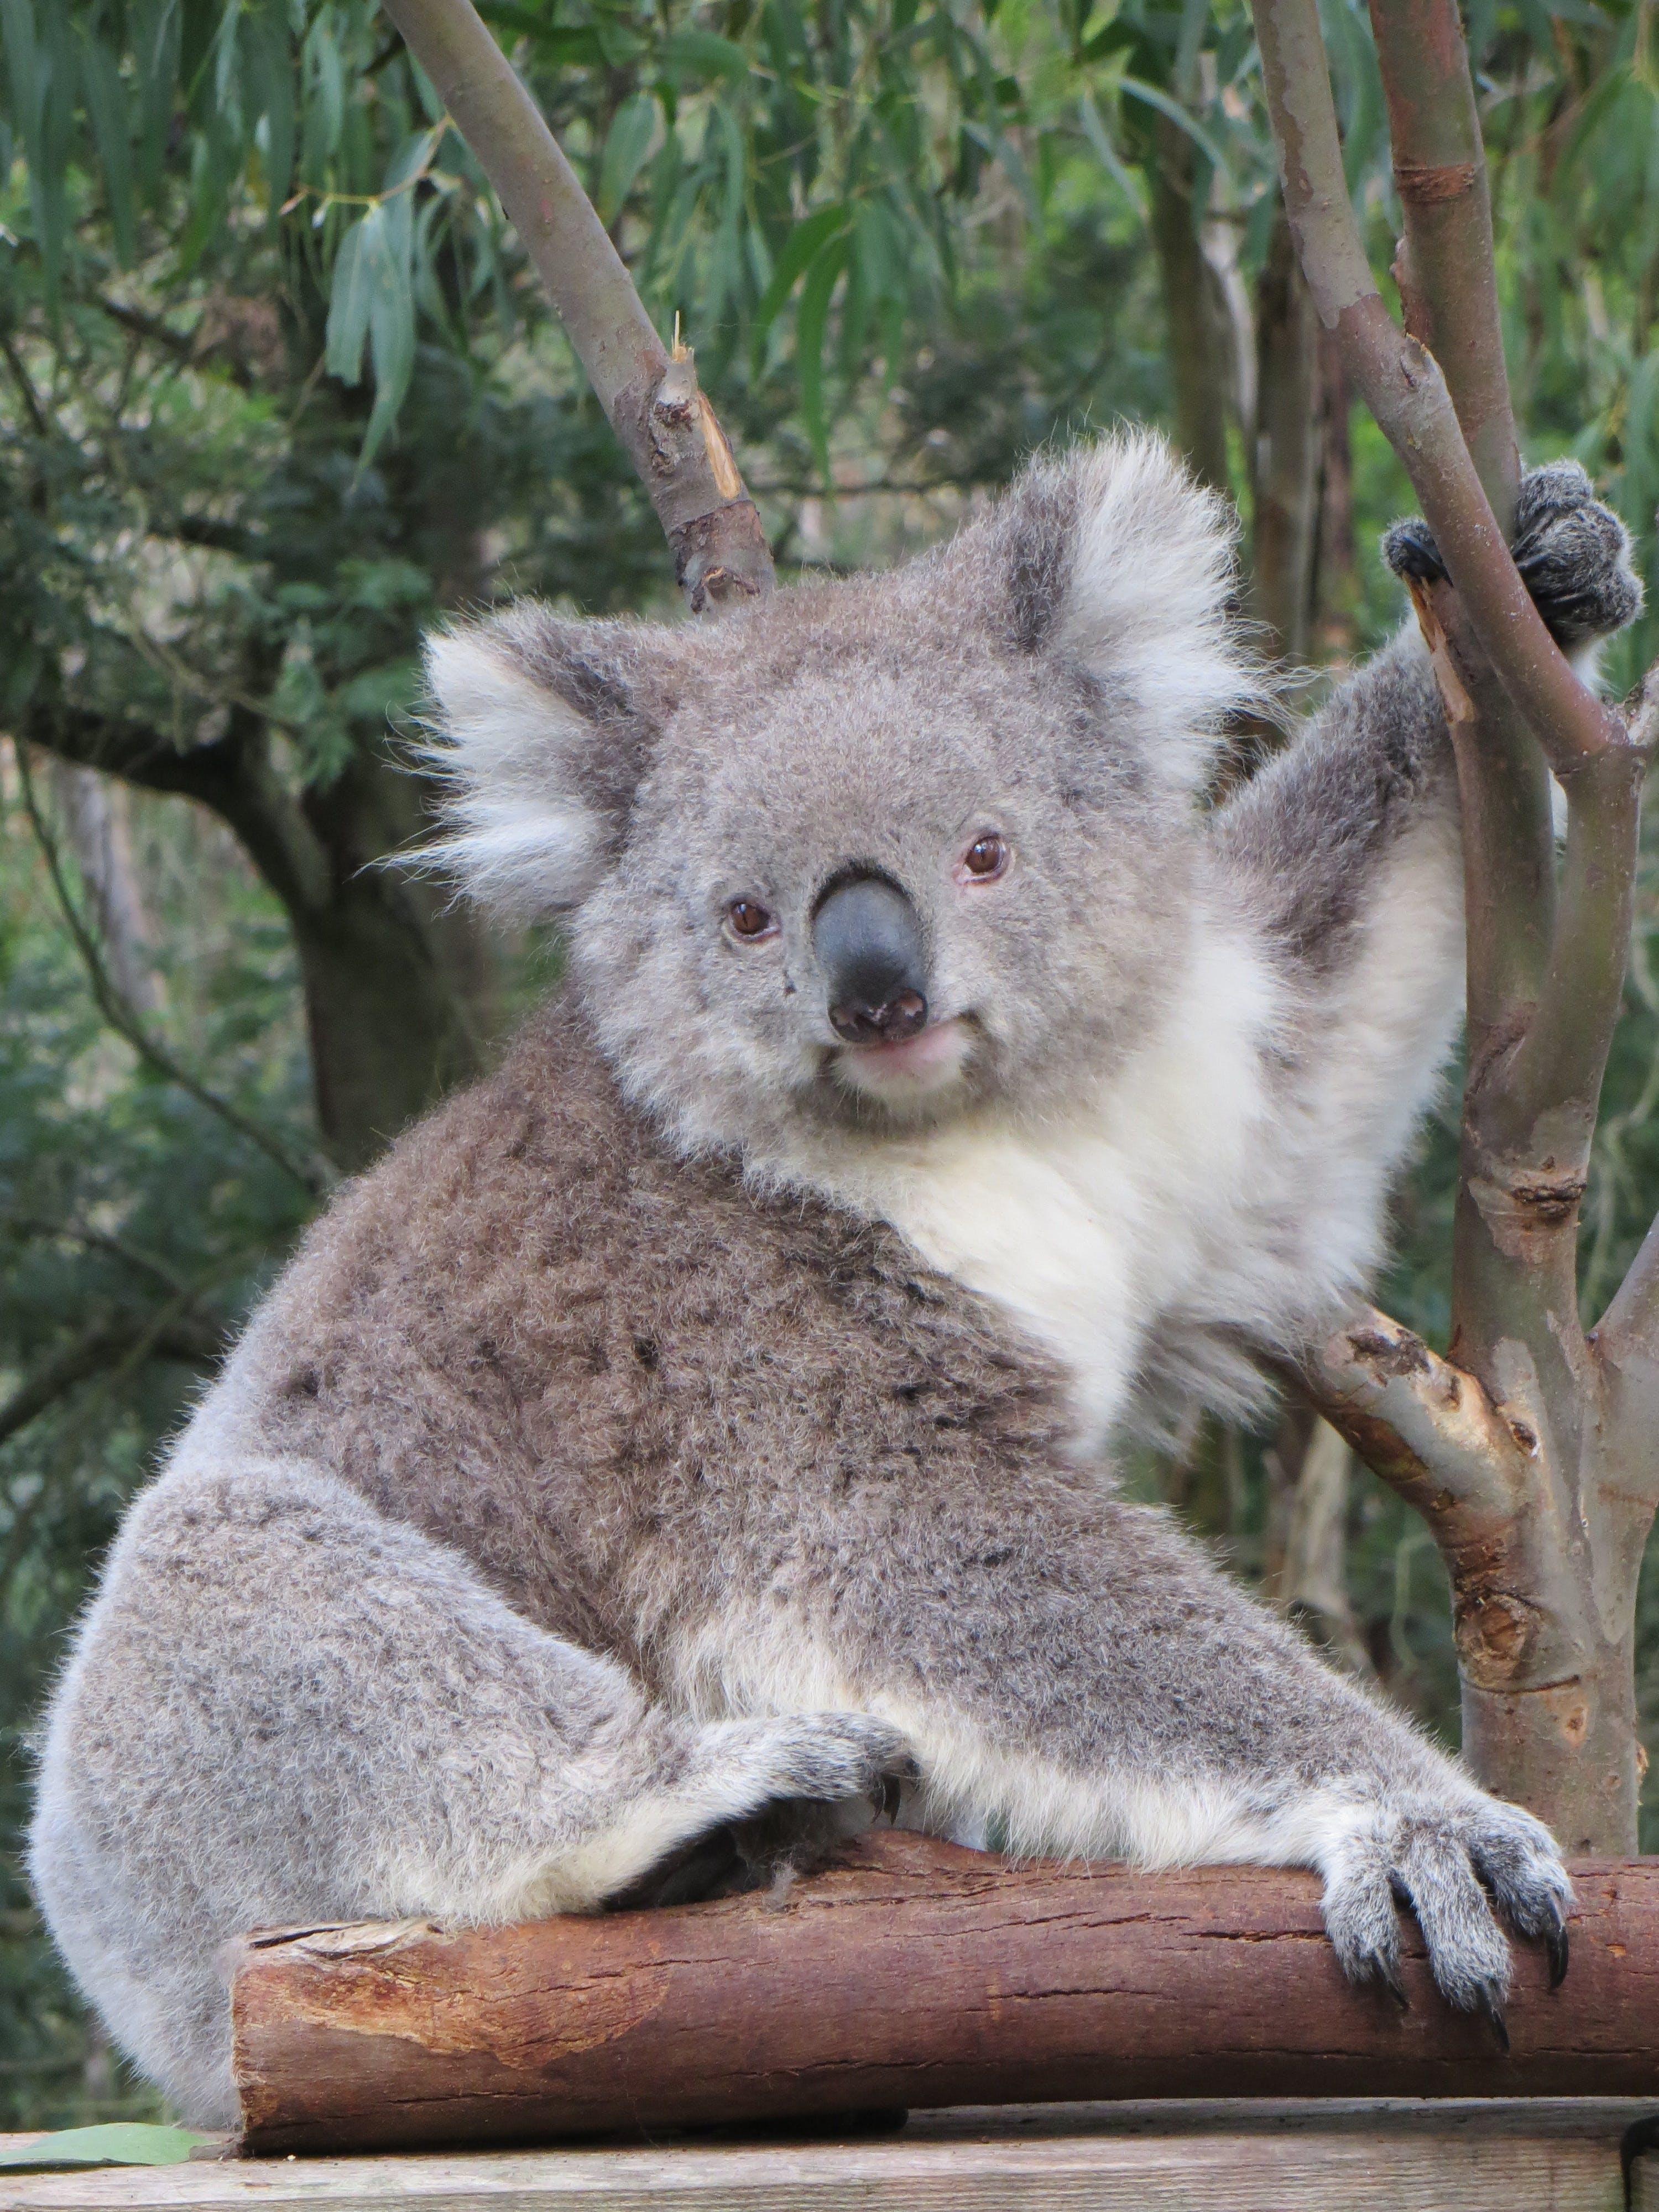 Free stock photo of nature, australia, animal, cute